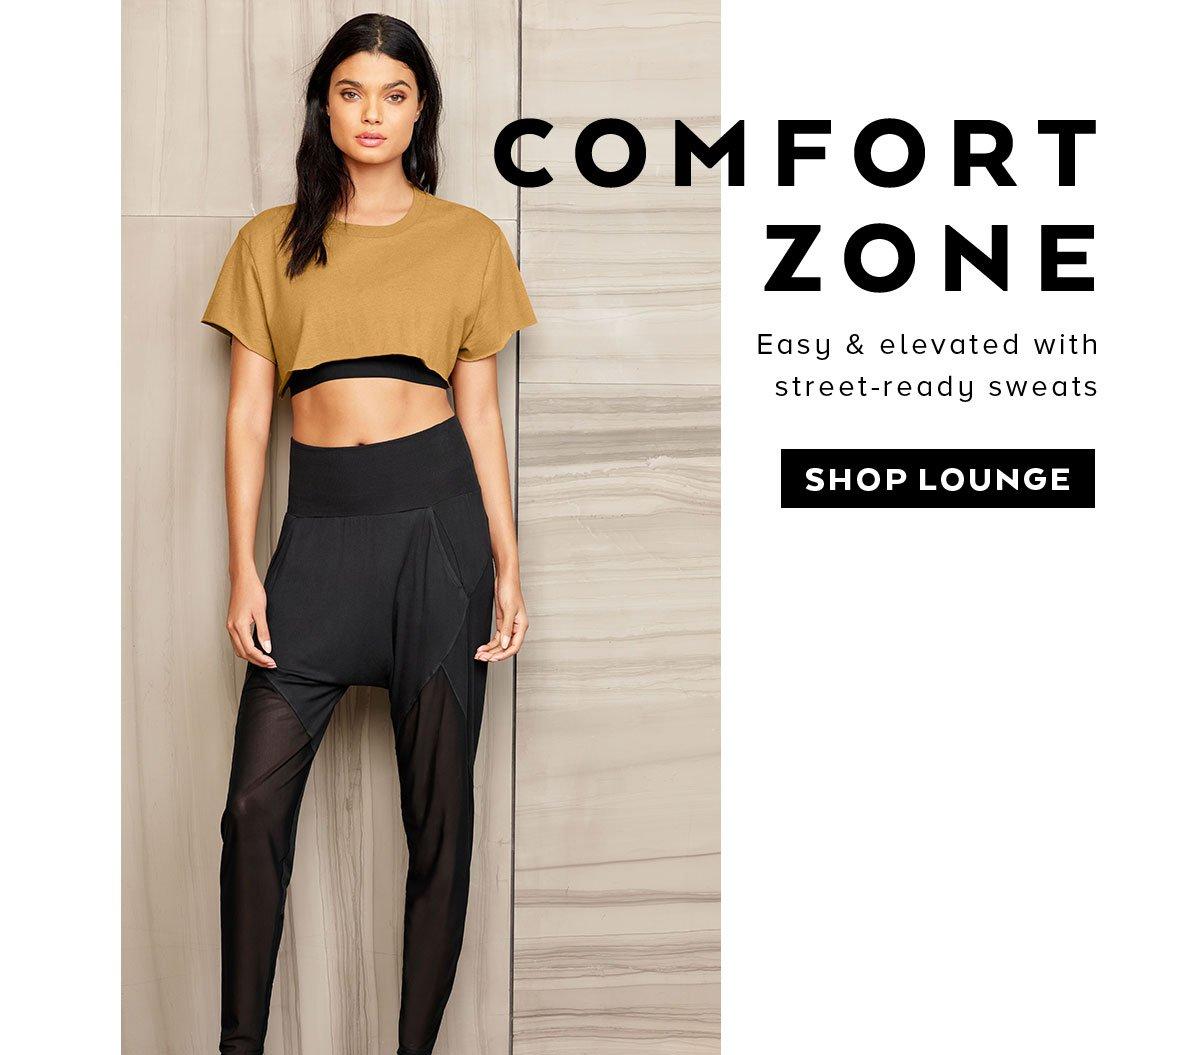 COMFORT ZONE - SHOP LOUNGE